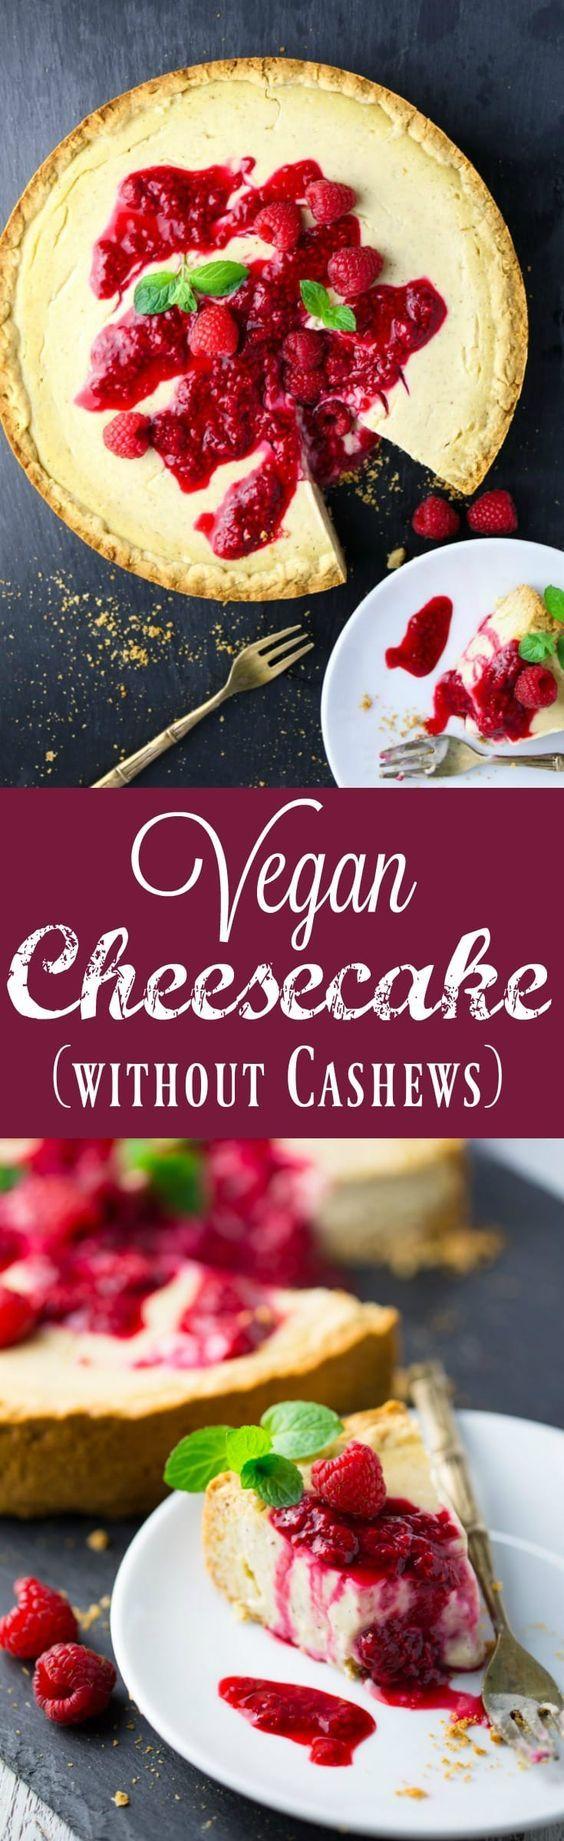 Vegan Cheesecake (without Cashews) - vanilla soy yogurt was used in this recipe.